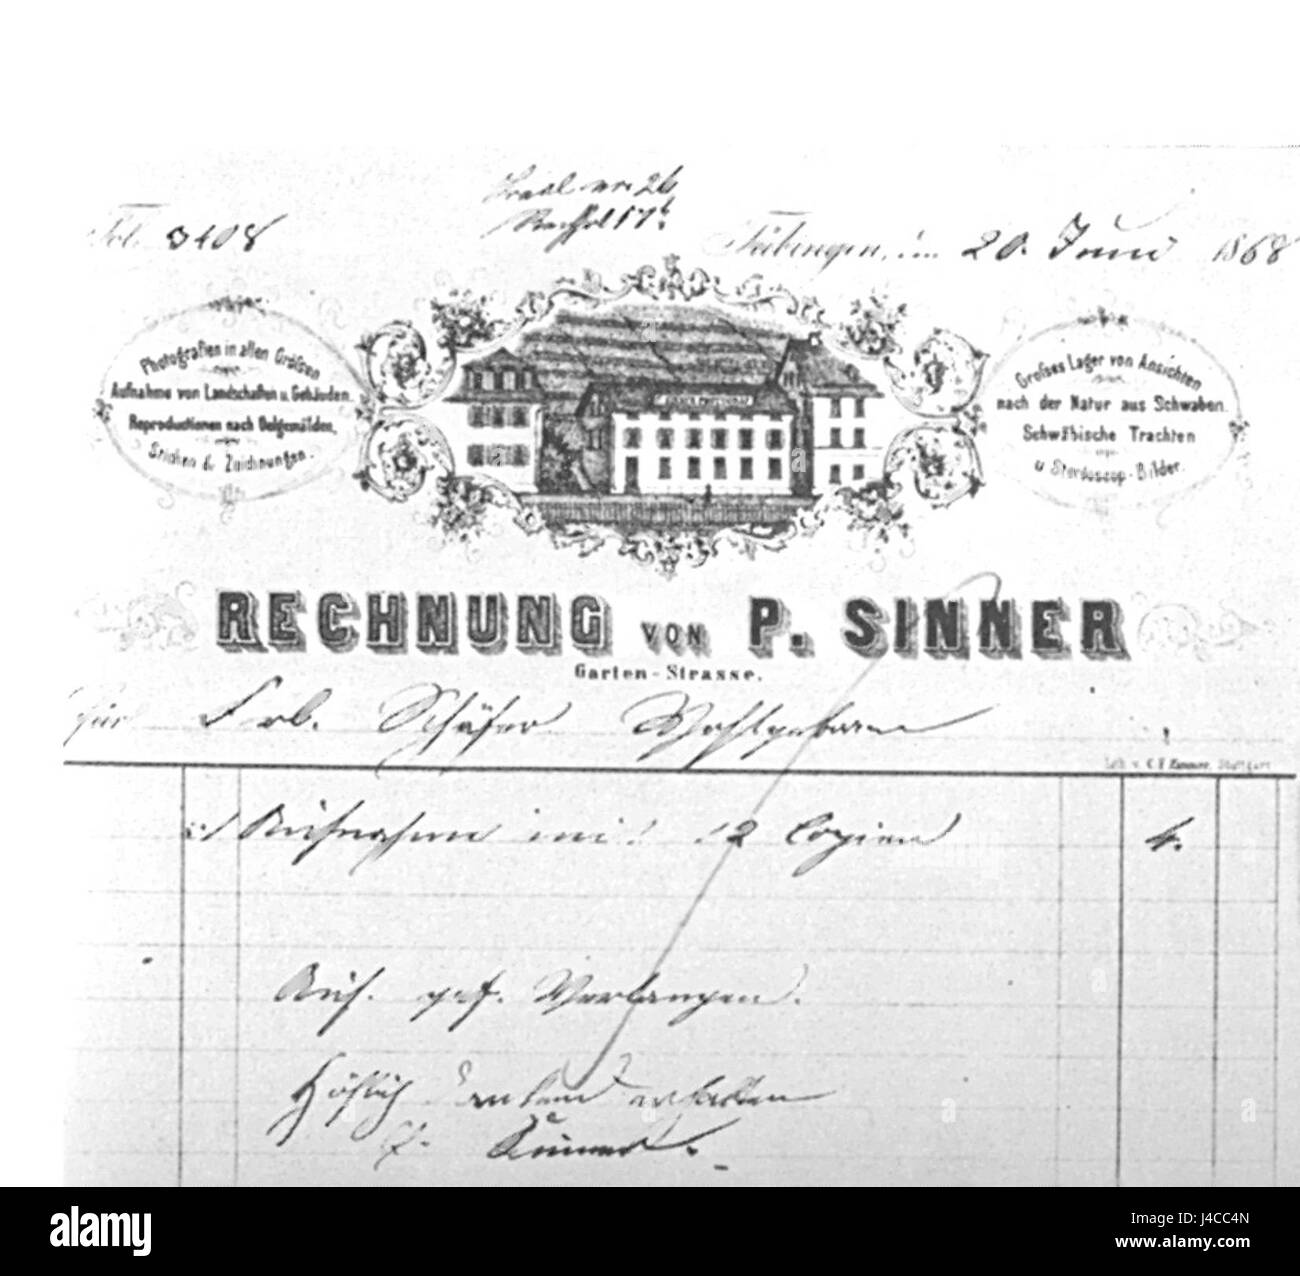 Rechnungsformular Paul Sinner Stock Photo: 140414533 - Alamy